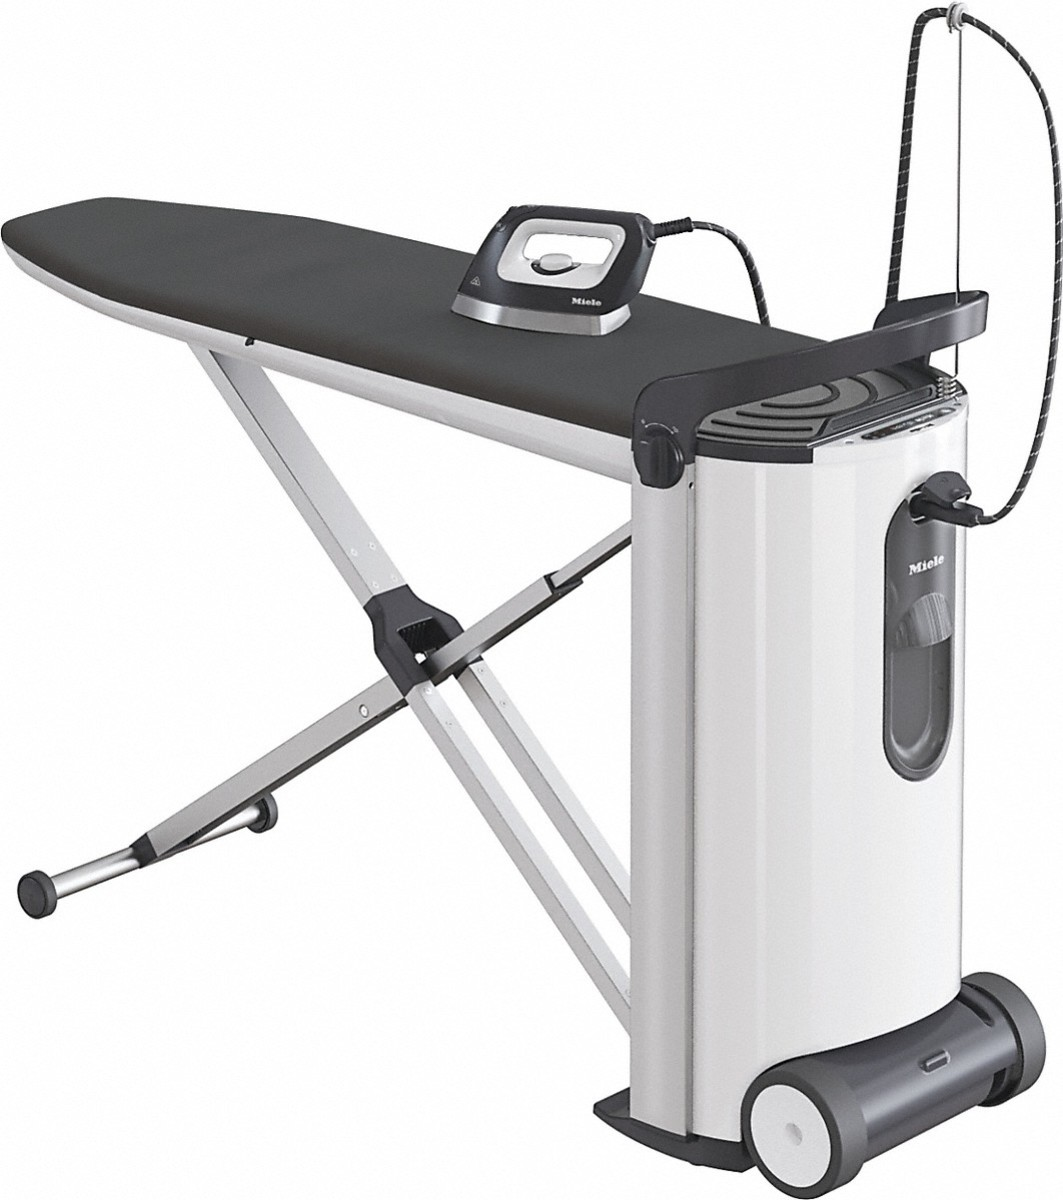 B 3826 FashionMaster  Steam ironing system 熨斗